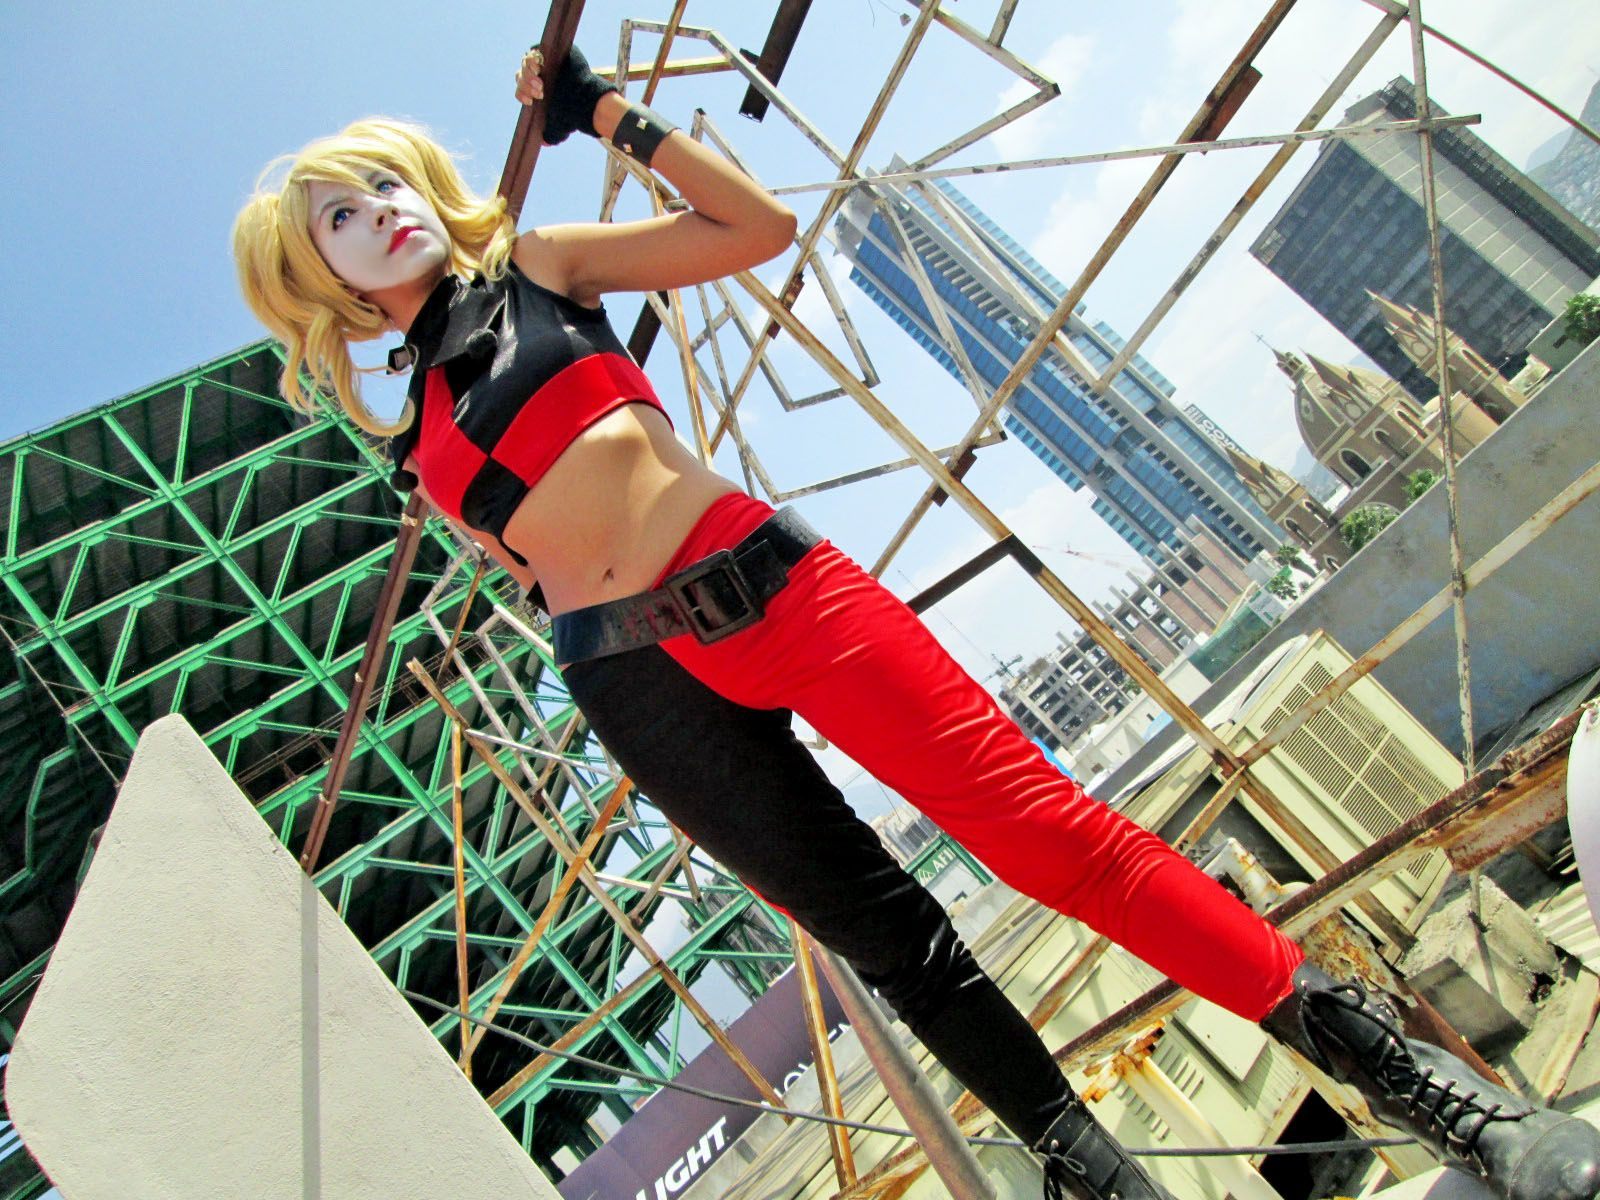 Harley quinn assault on arkham cosplay